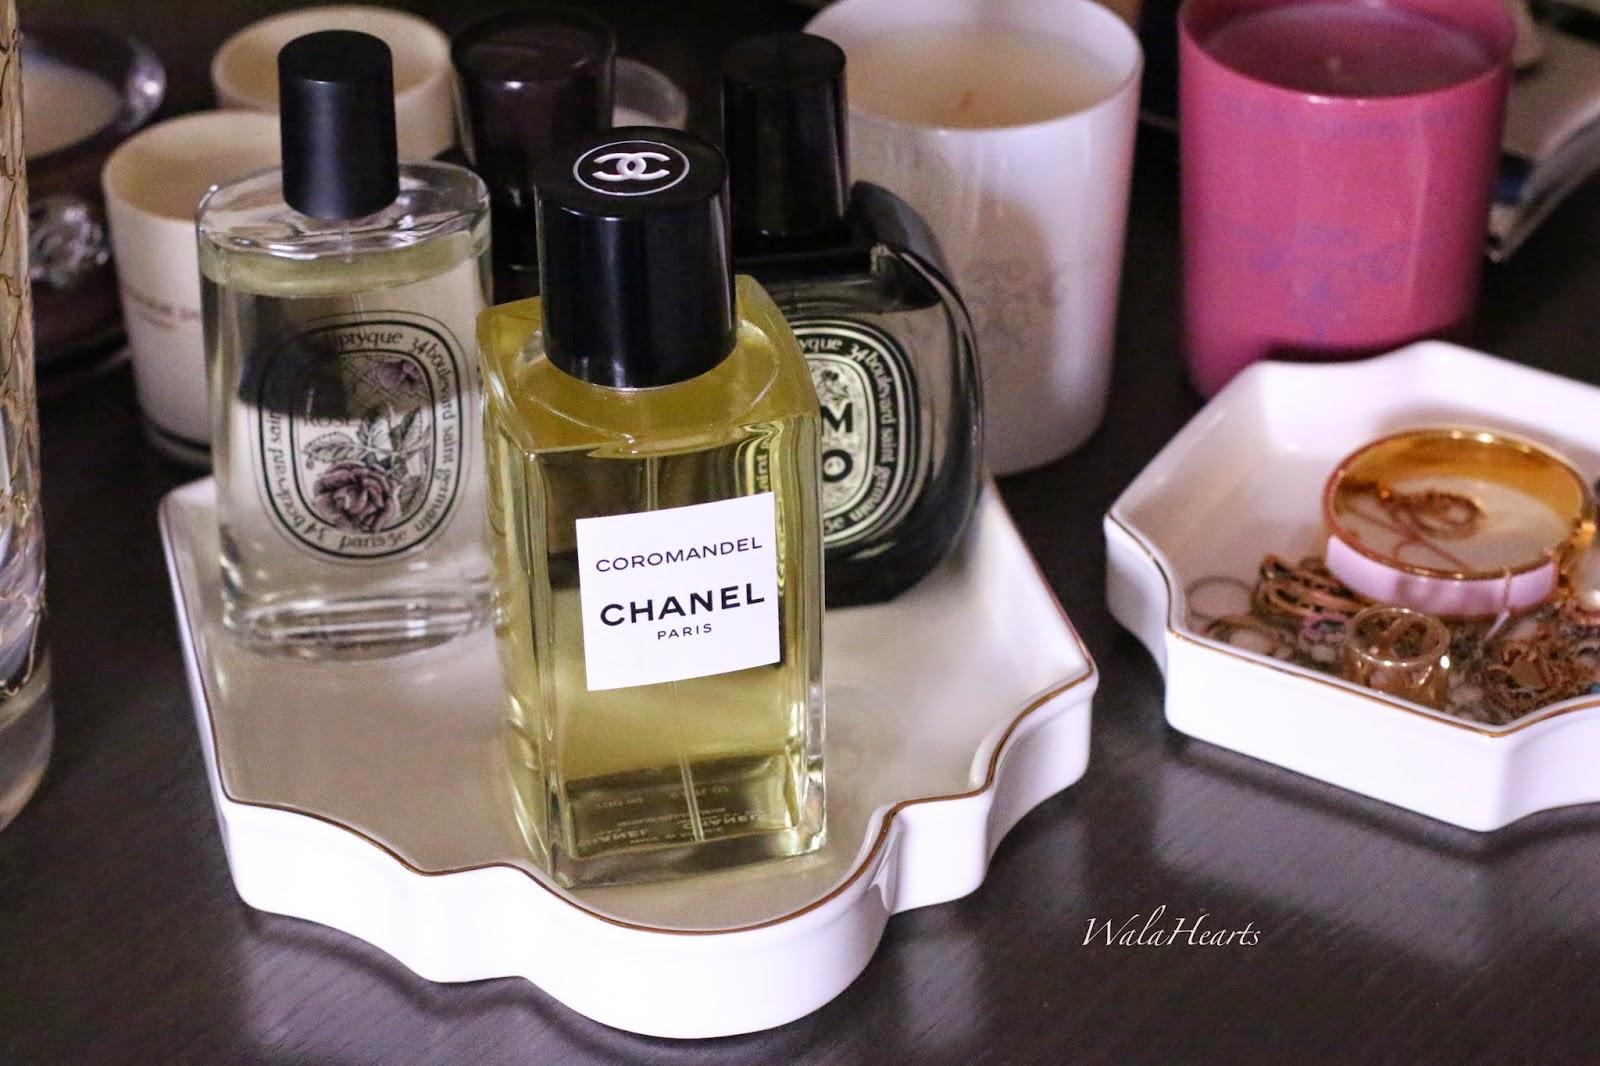 69f103efa CHANEL COROMANDEL Perfume | WalaHearts | Bloglovin'